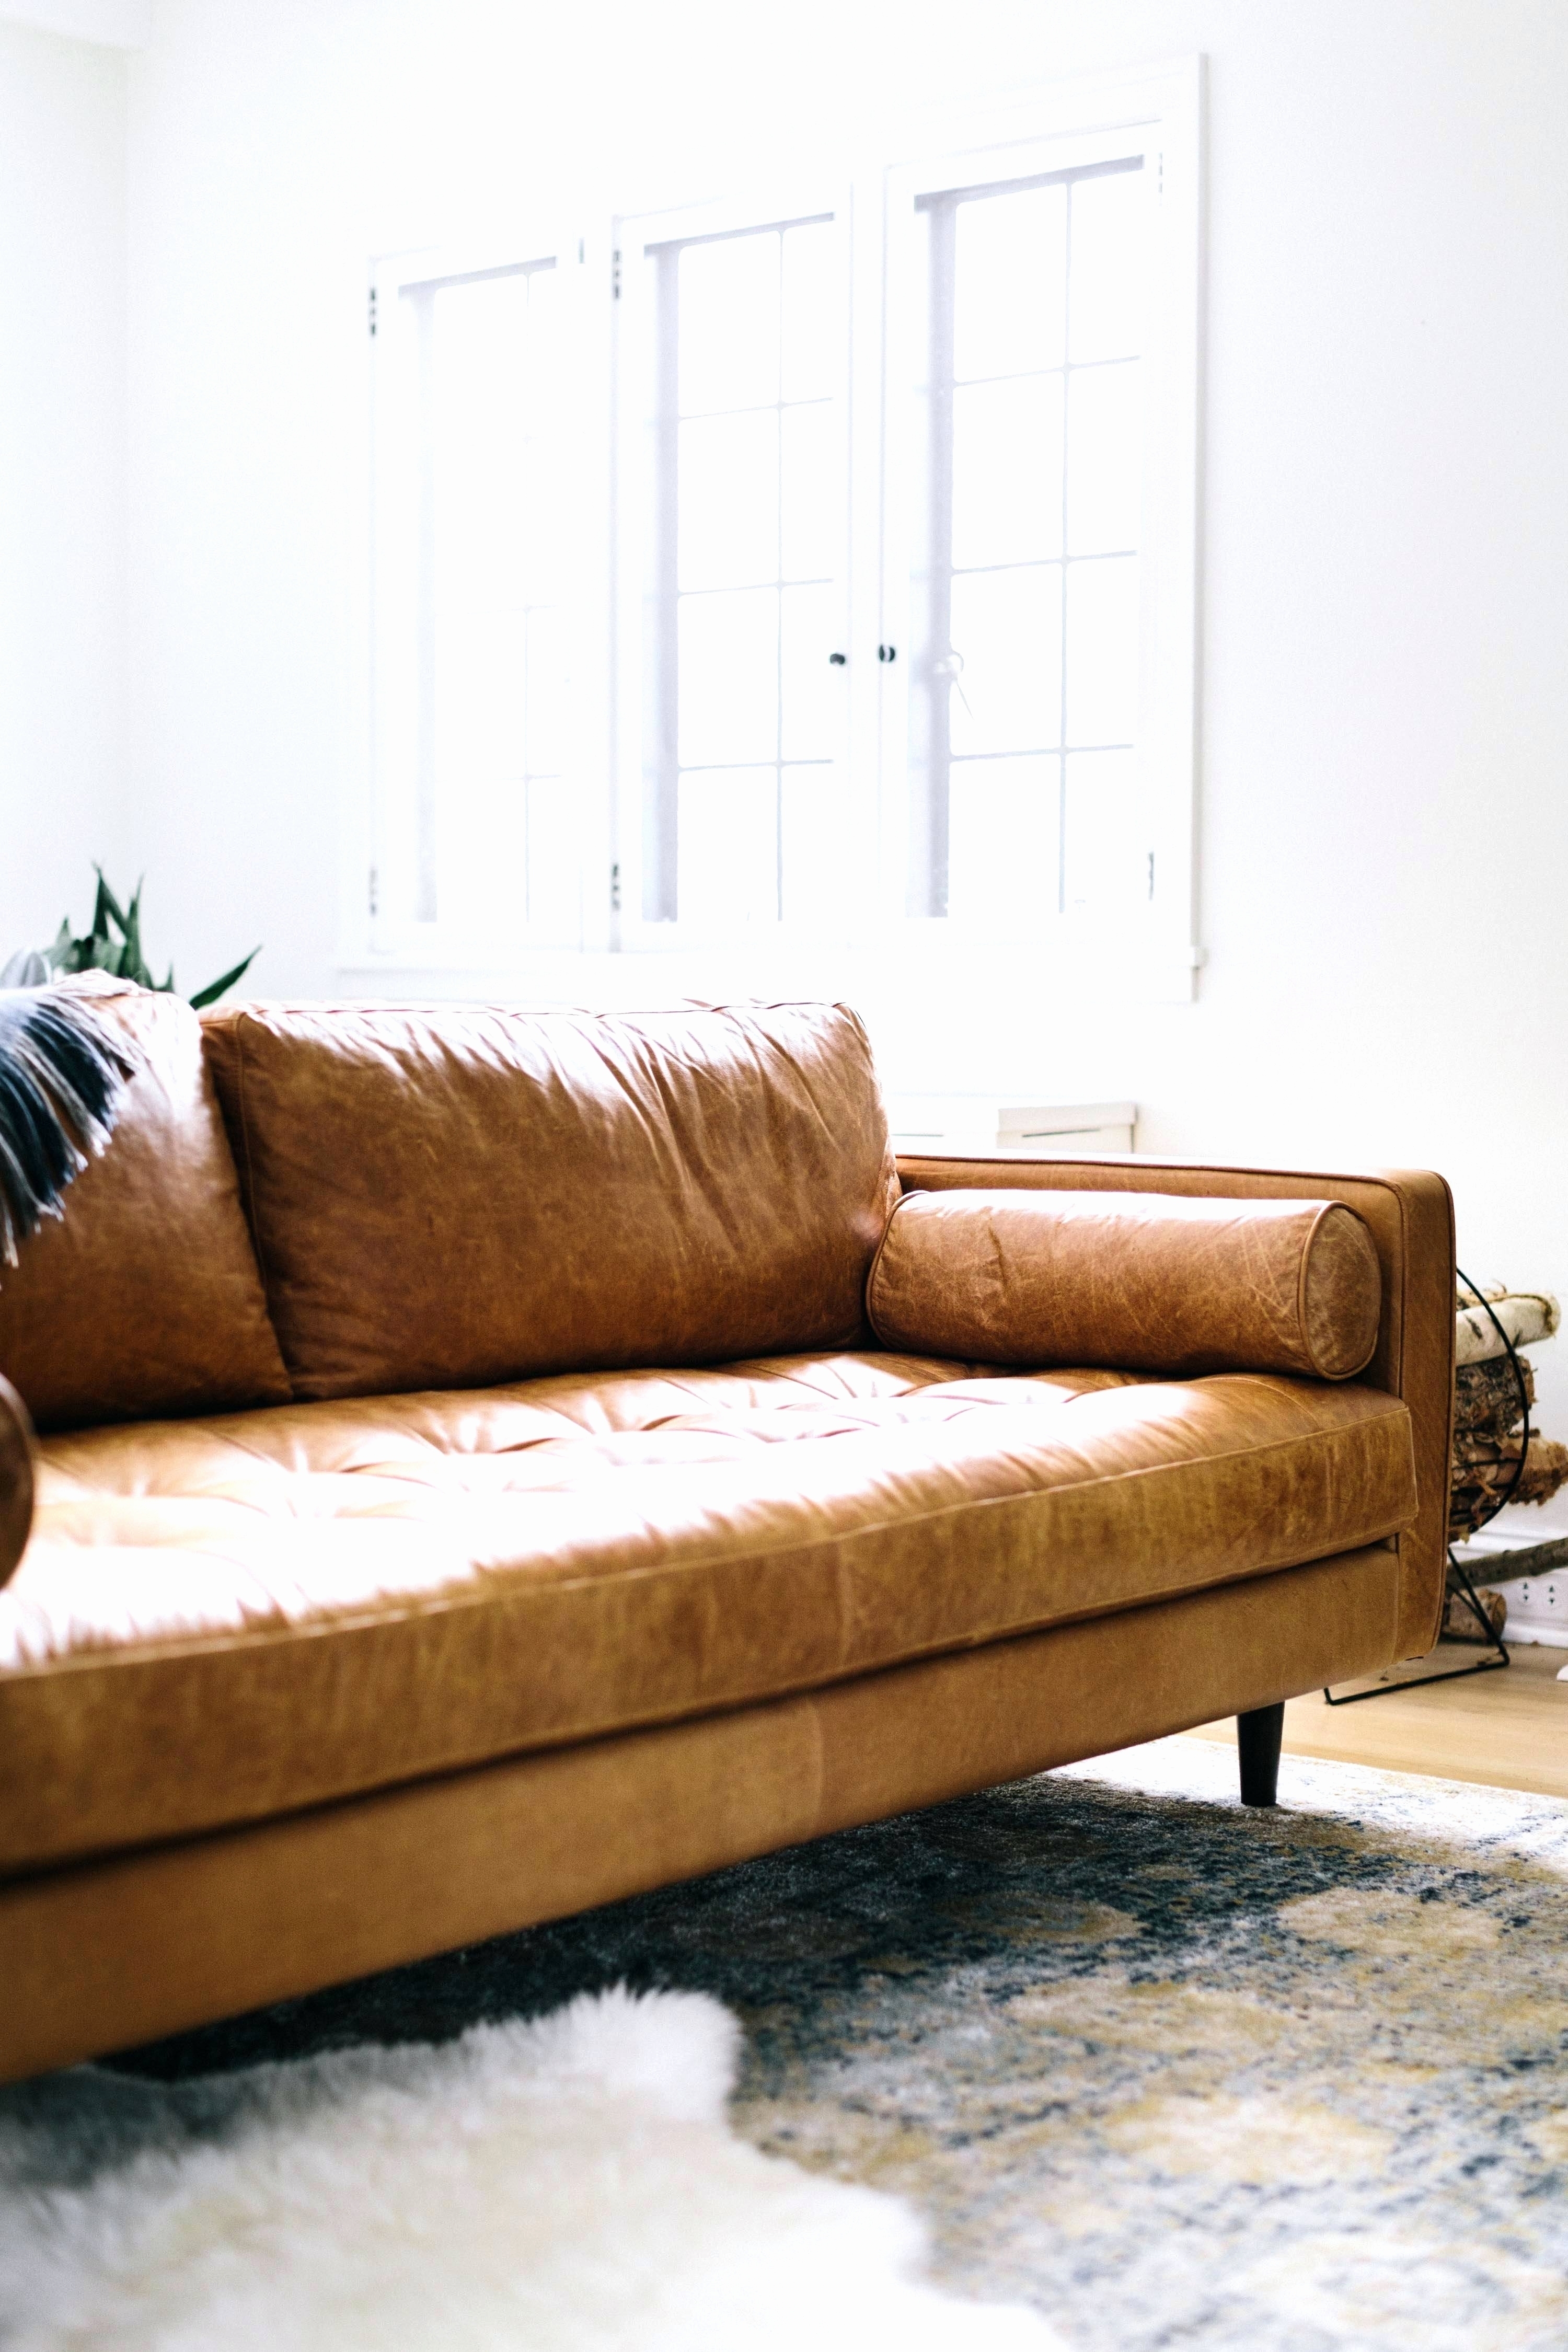 Kijiji Kitchener Inspirational Home Style Furniture Opening Hours 2 Pertaining To Kijiji Kitchener Sectional Sofas (Photo 7 of 10)